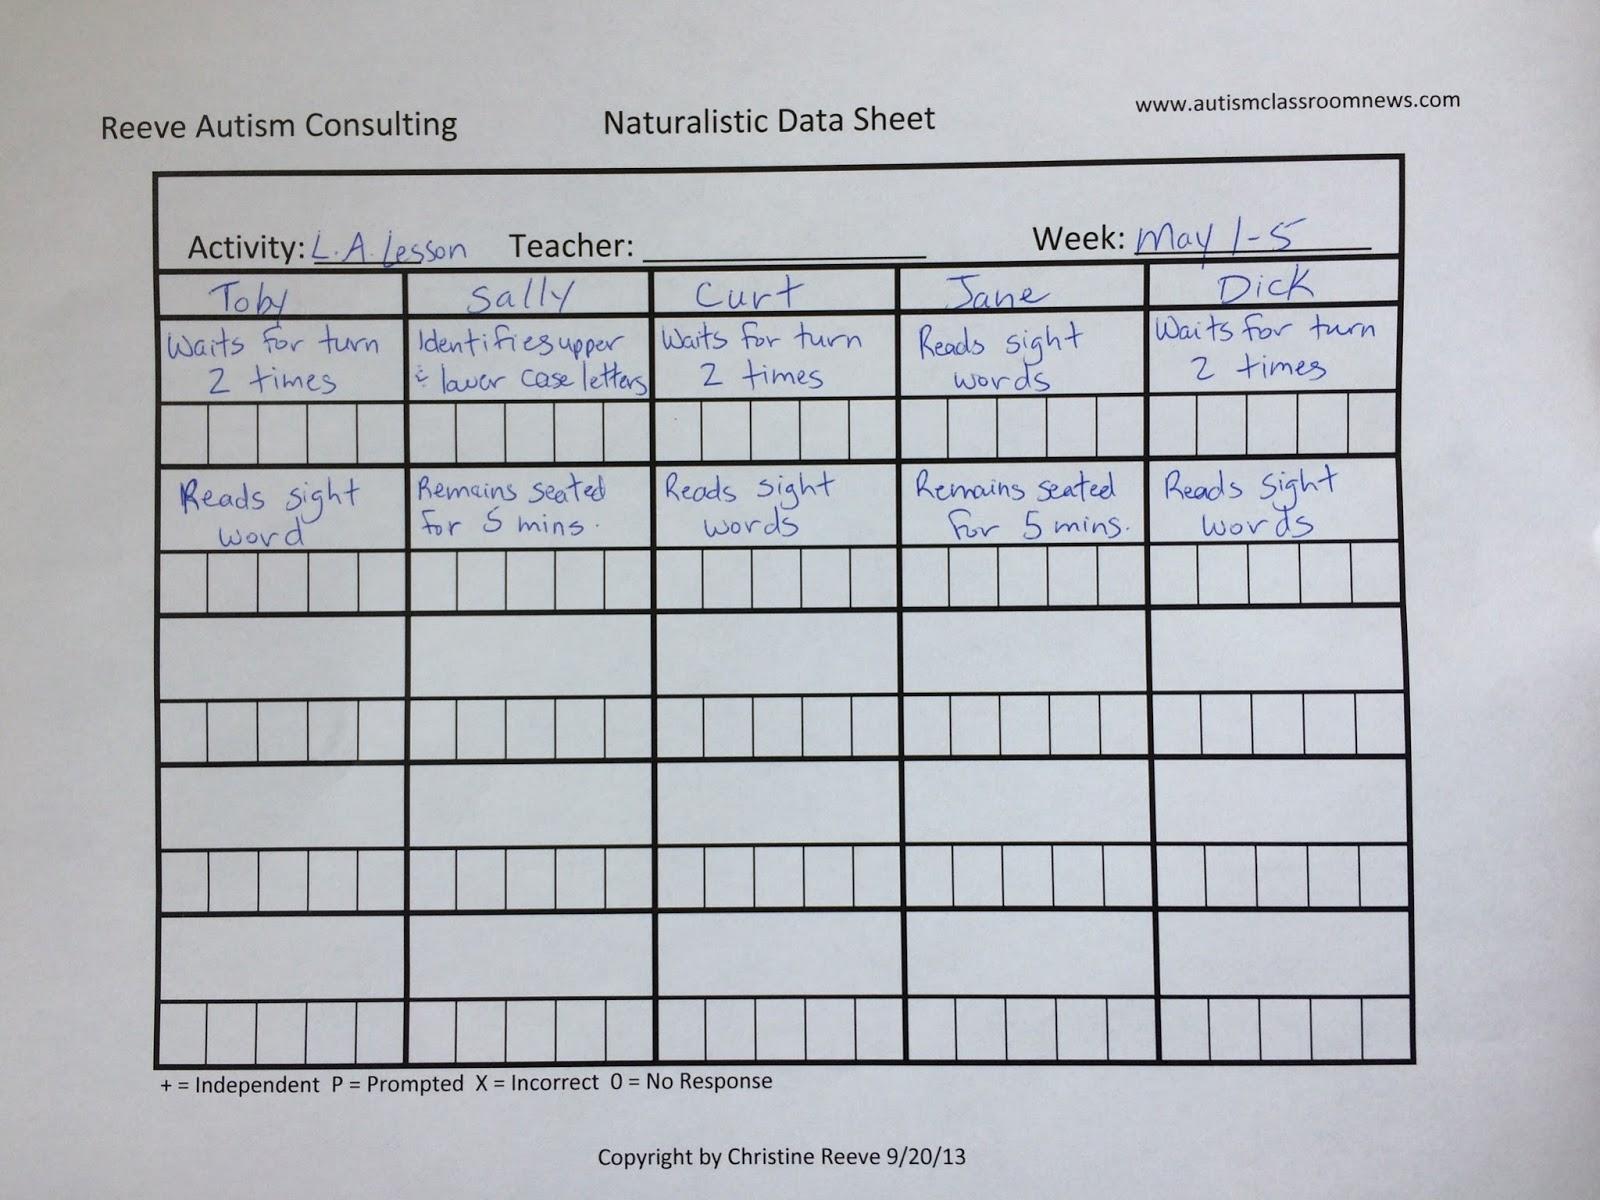 Adventures in the ATC: Monitoring Progress Through Data